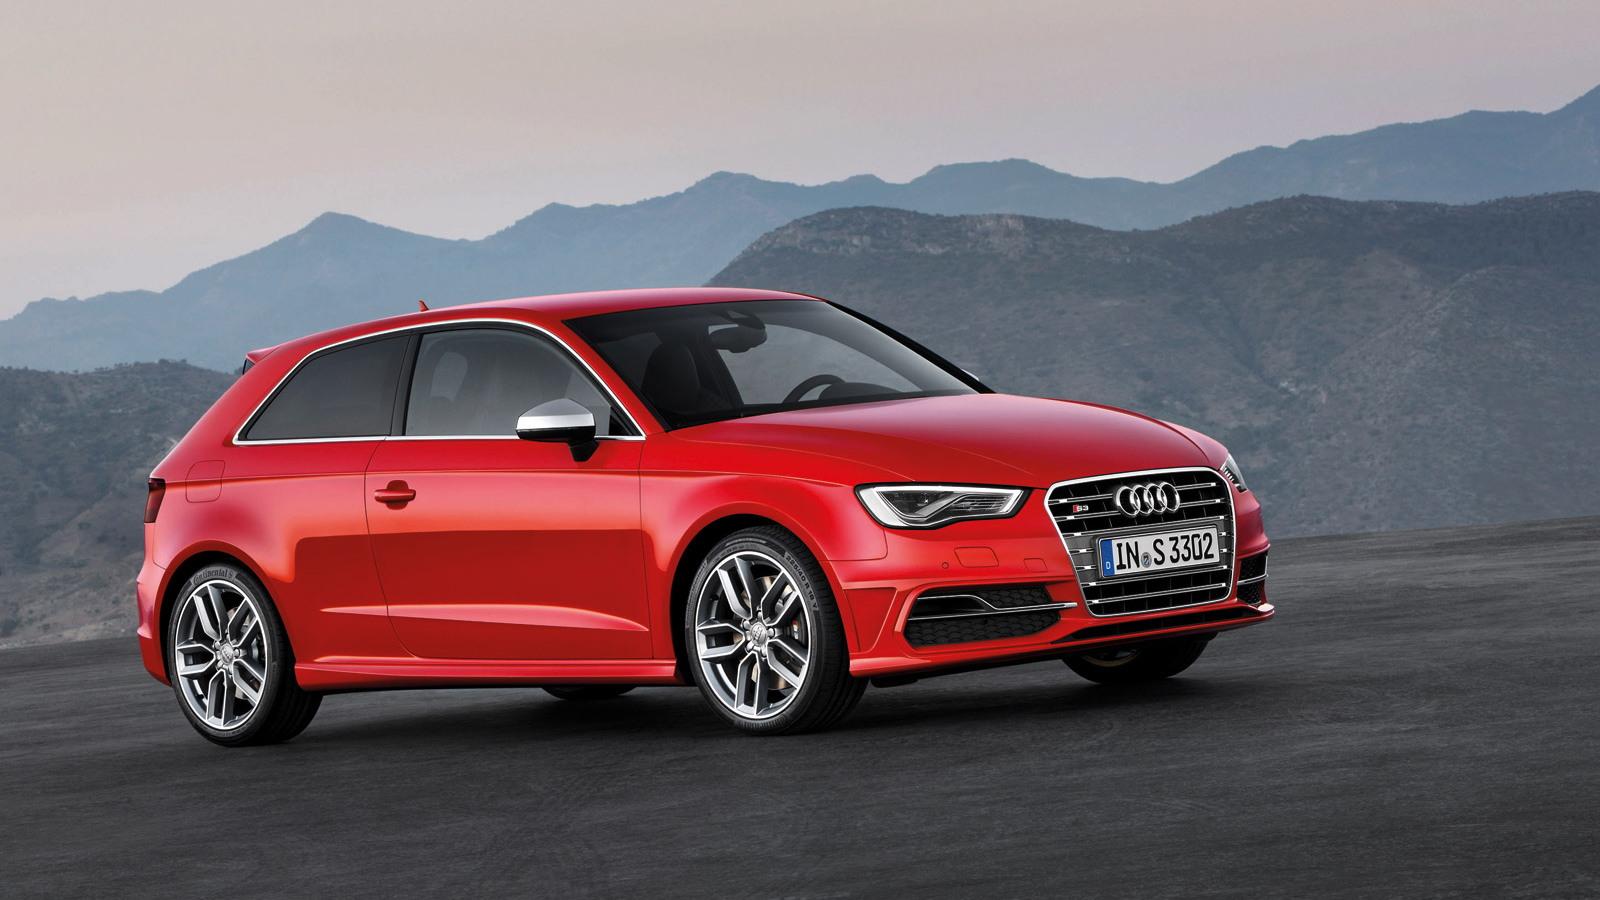 Kelebihan Kekurangan Audi S3 2014 Review